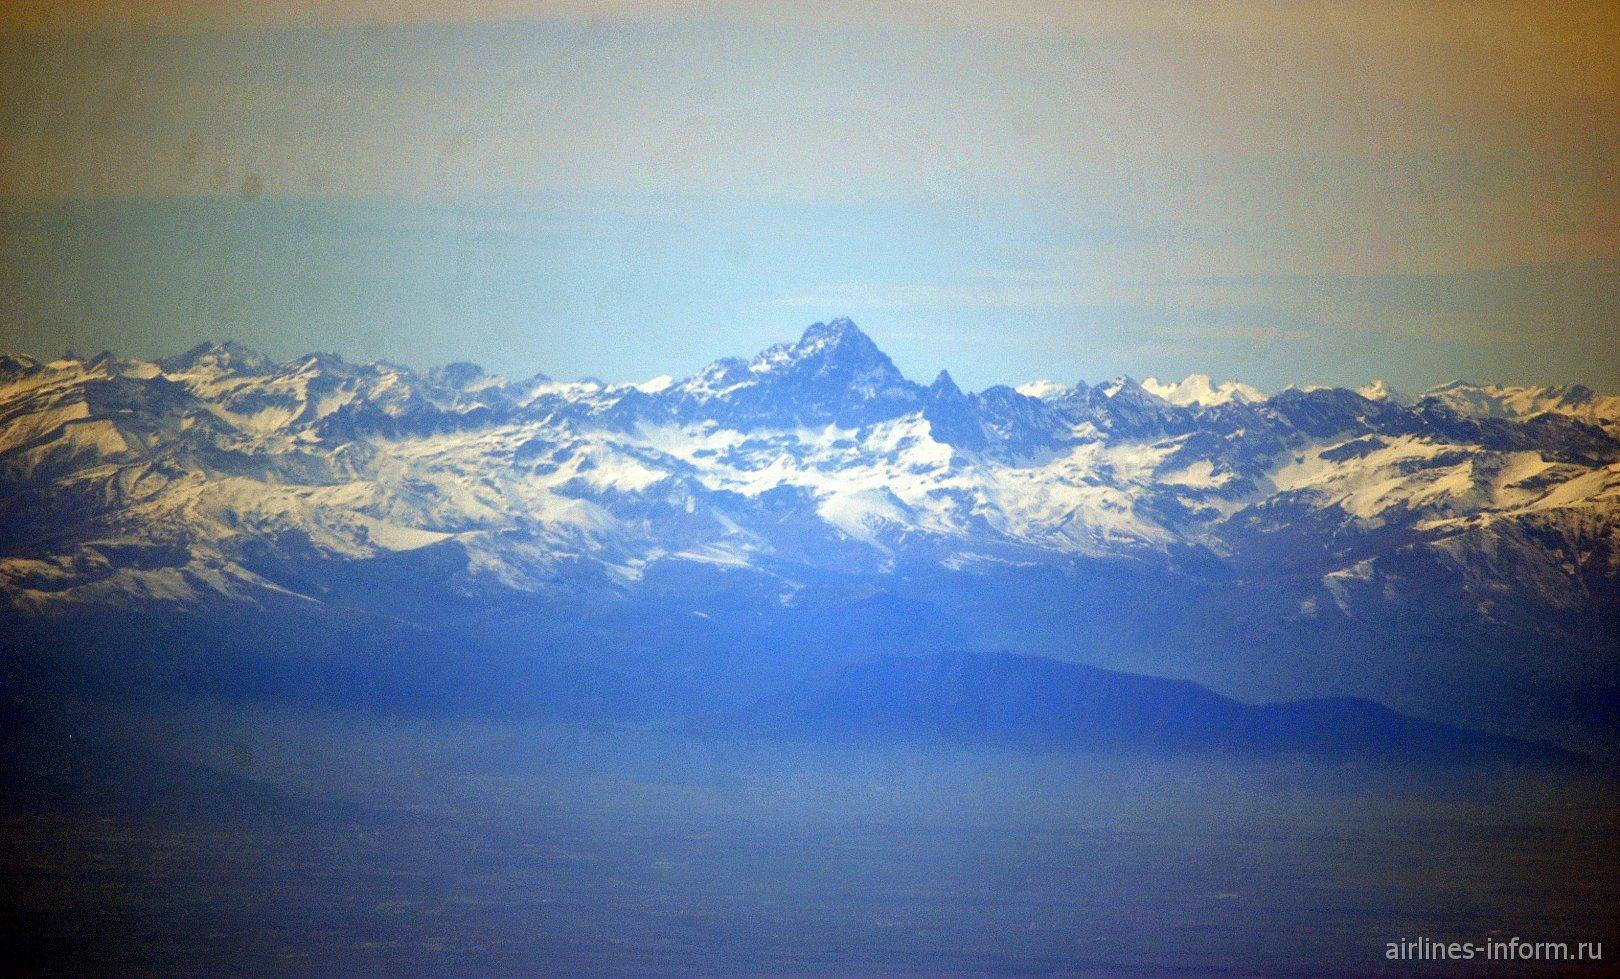 Гора Монте-Визо в Лигурийских Альпах в Италии